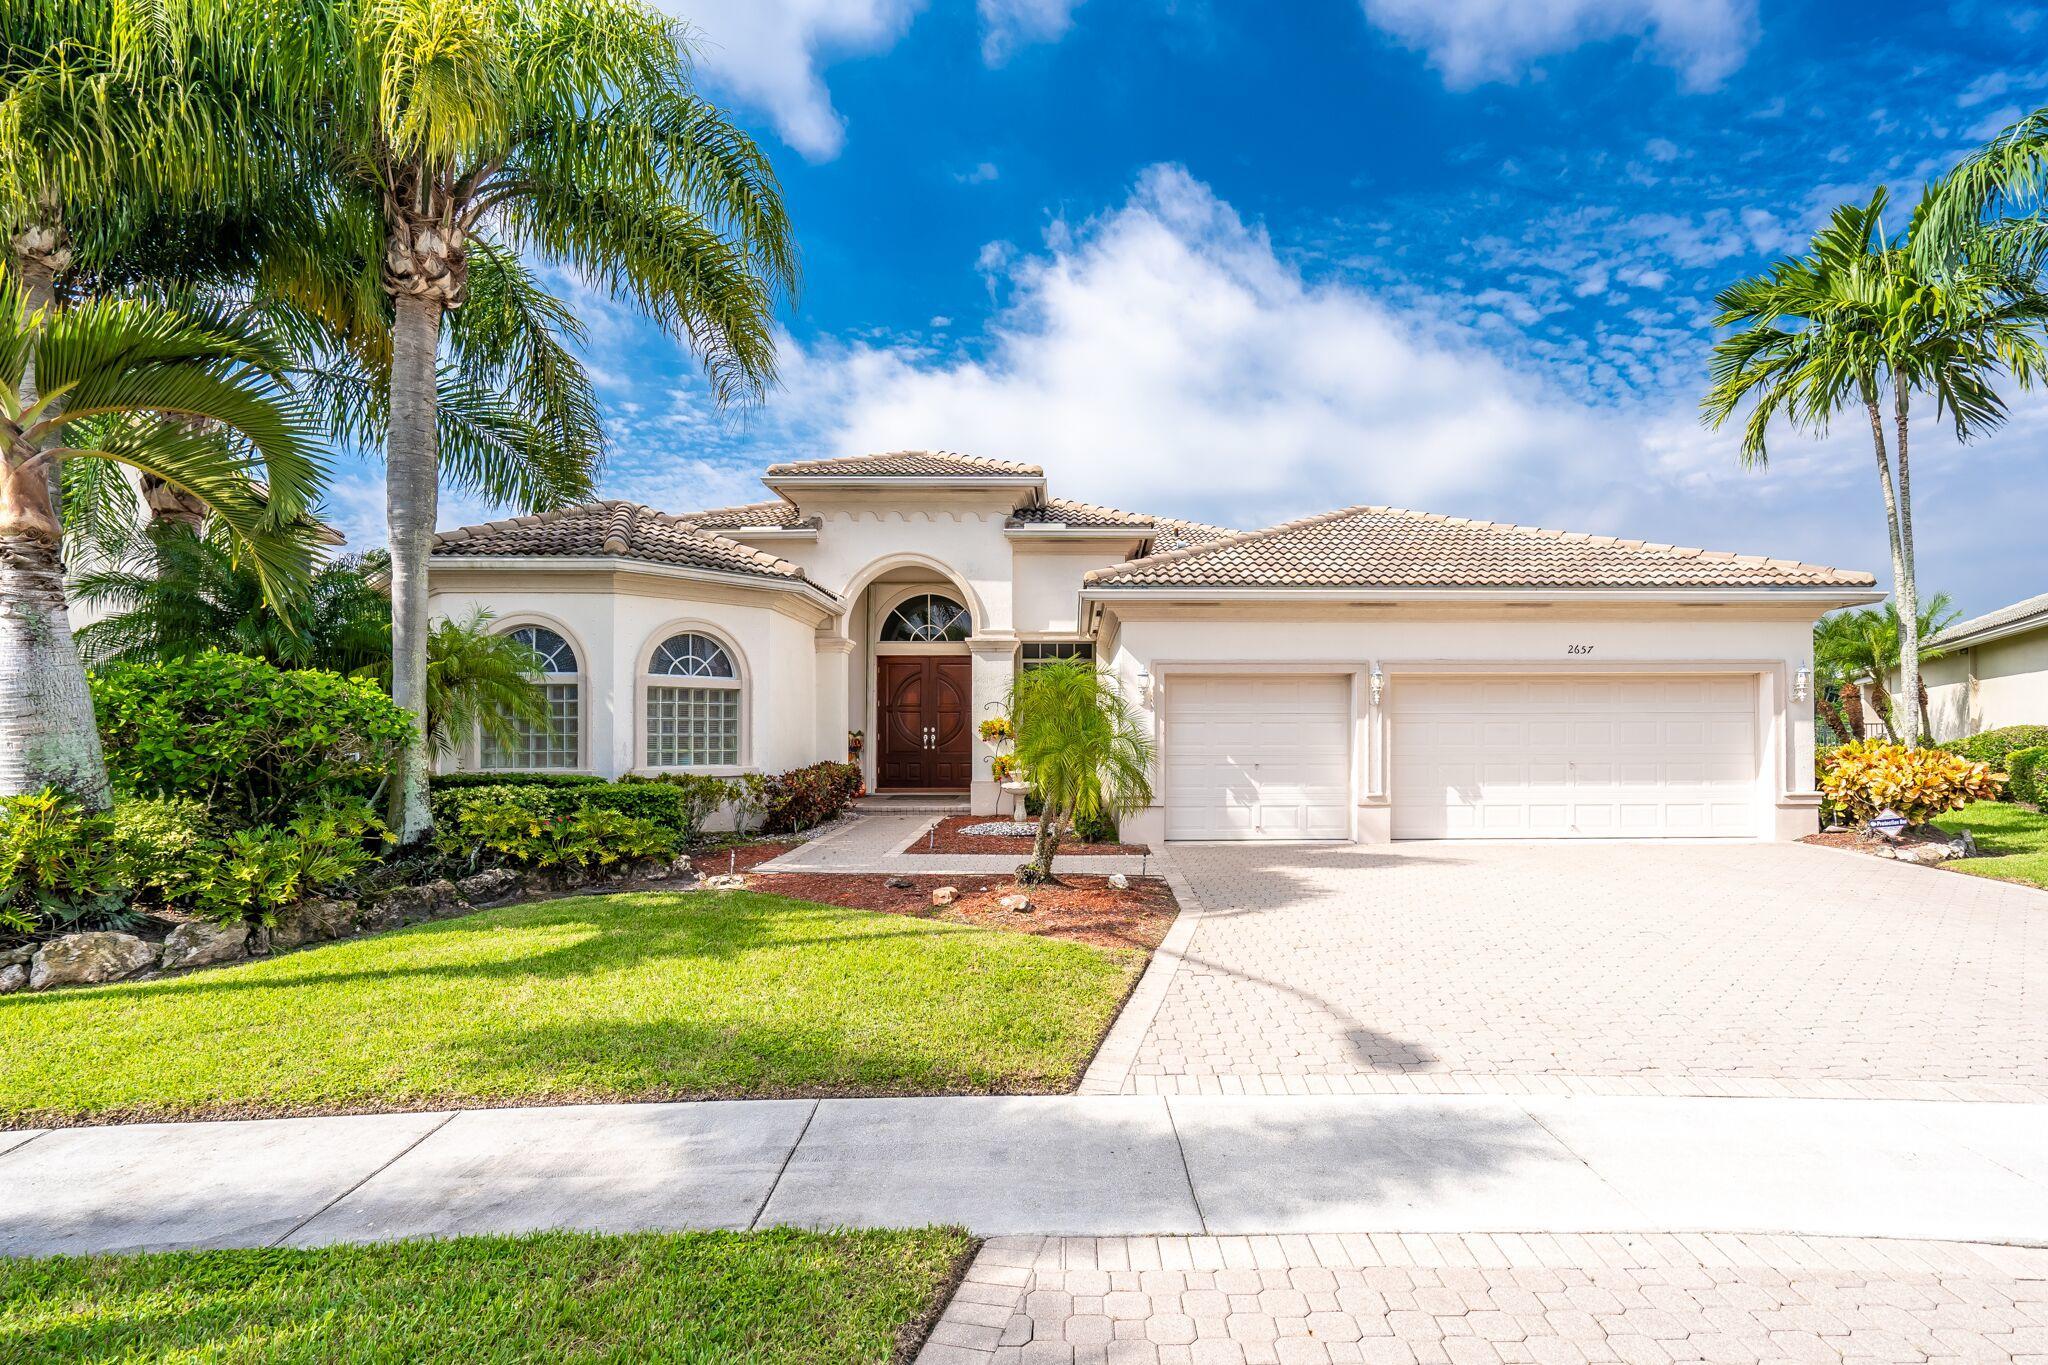 2657 Windwood Way Royal Palm Beach, FL 33411